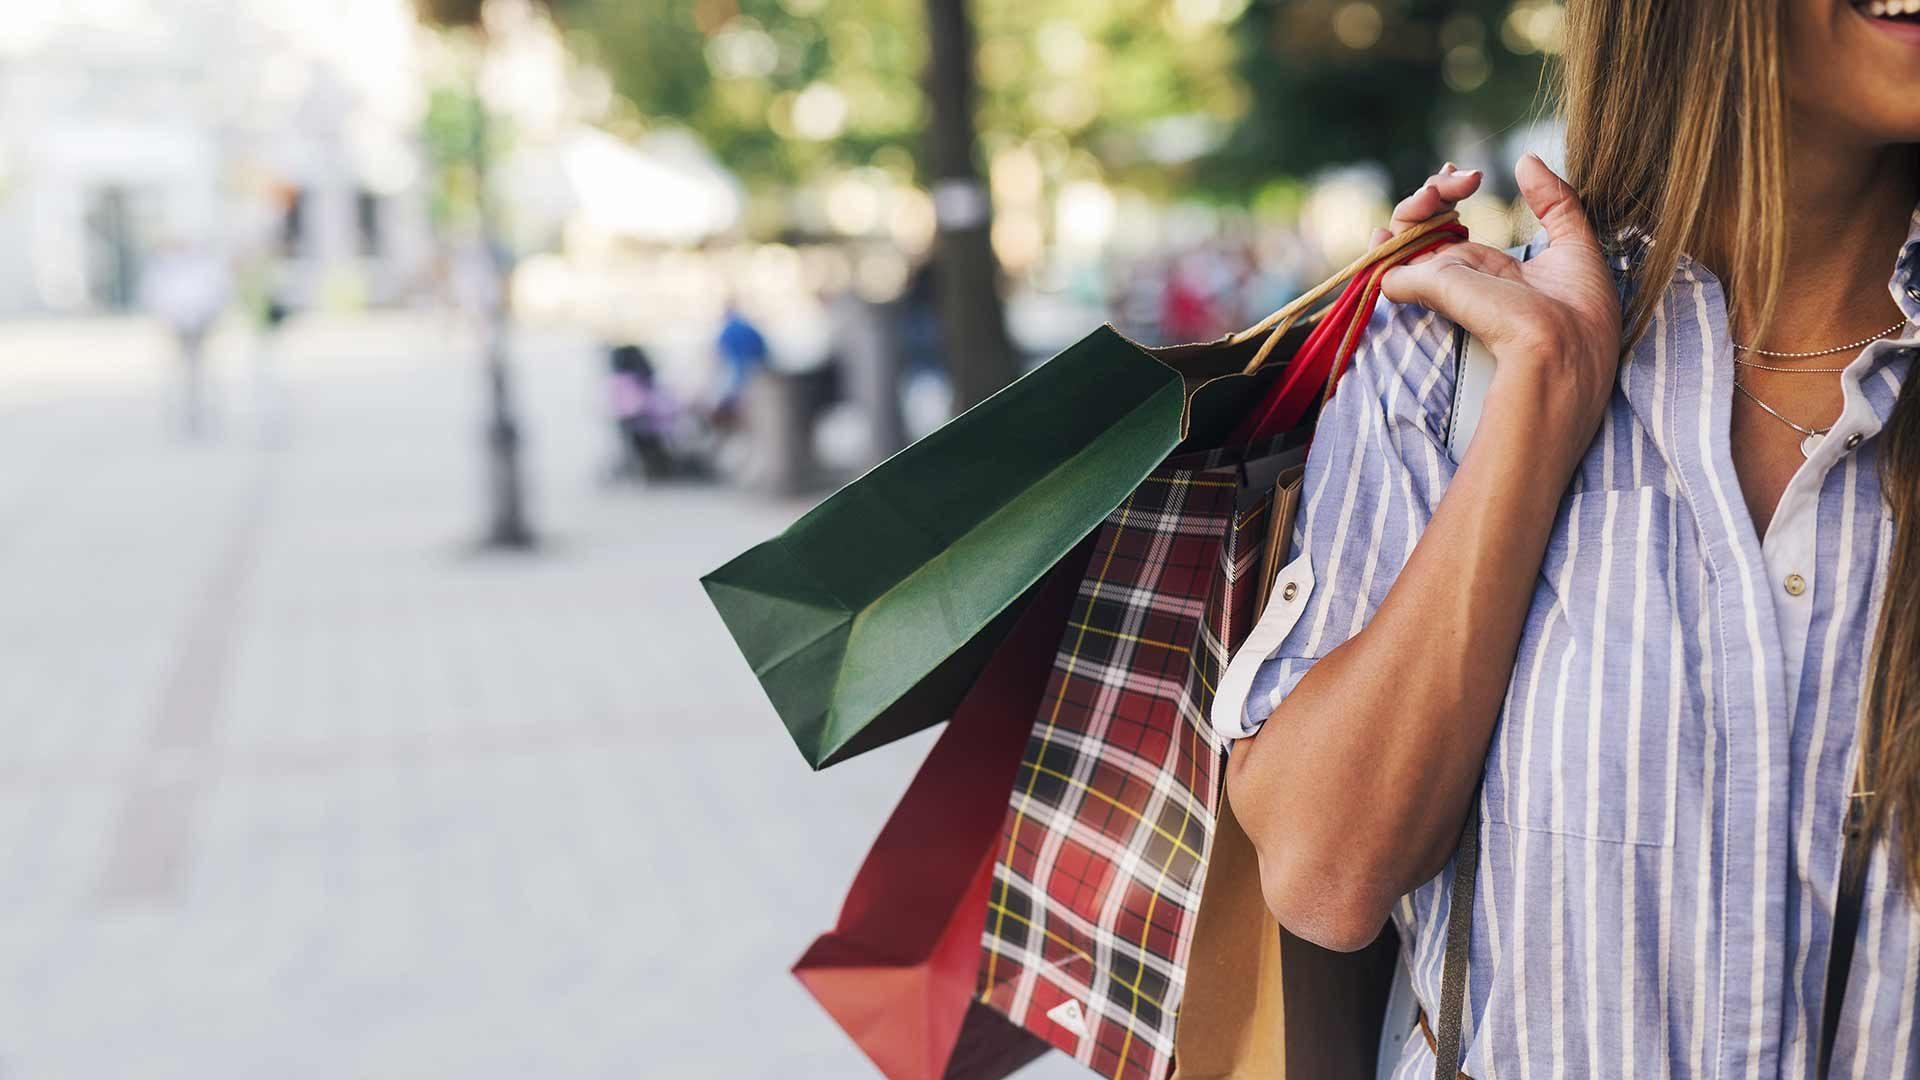 Shoppingbummel